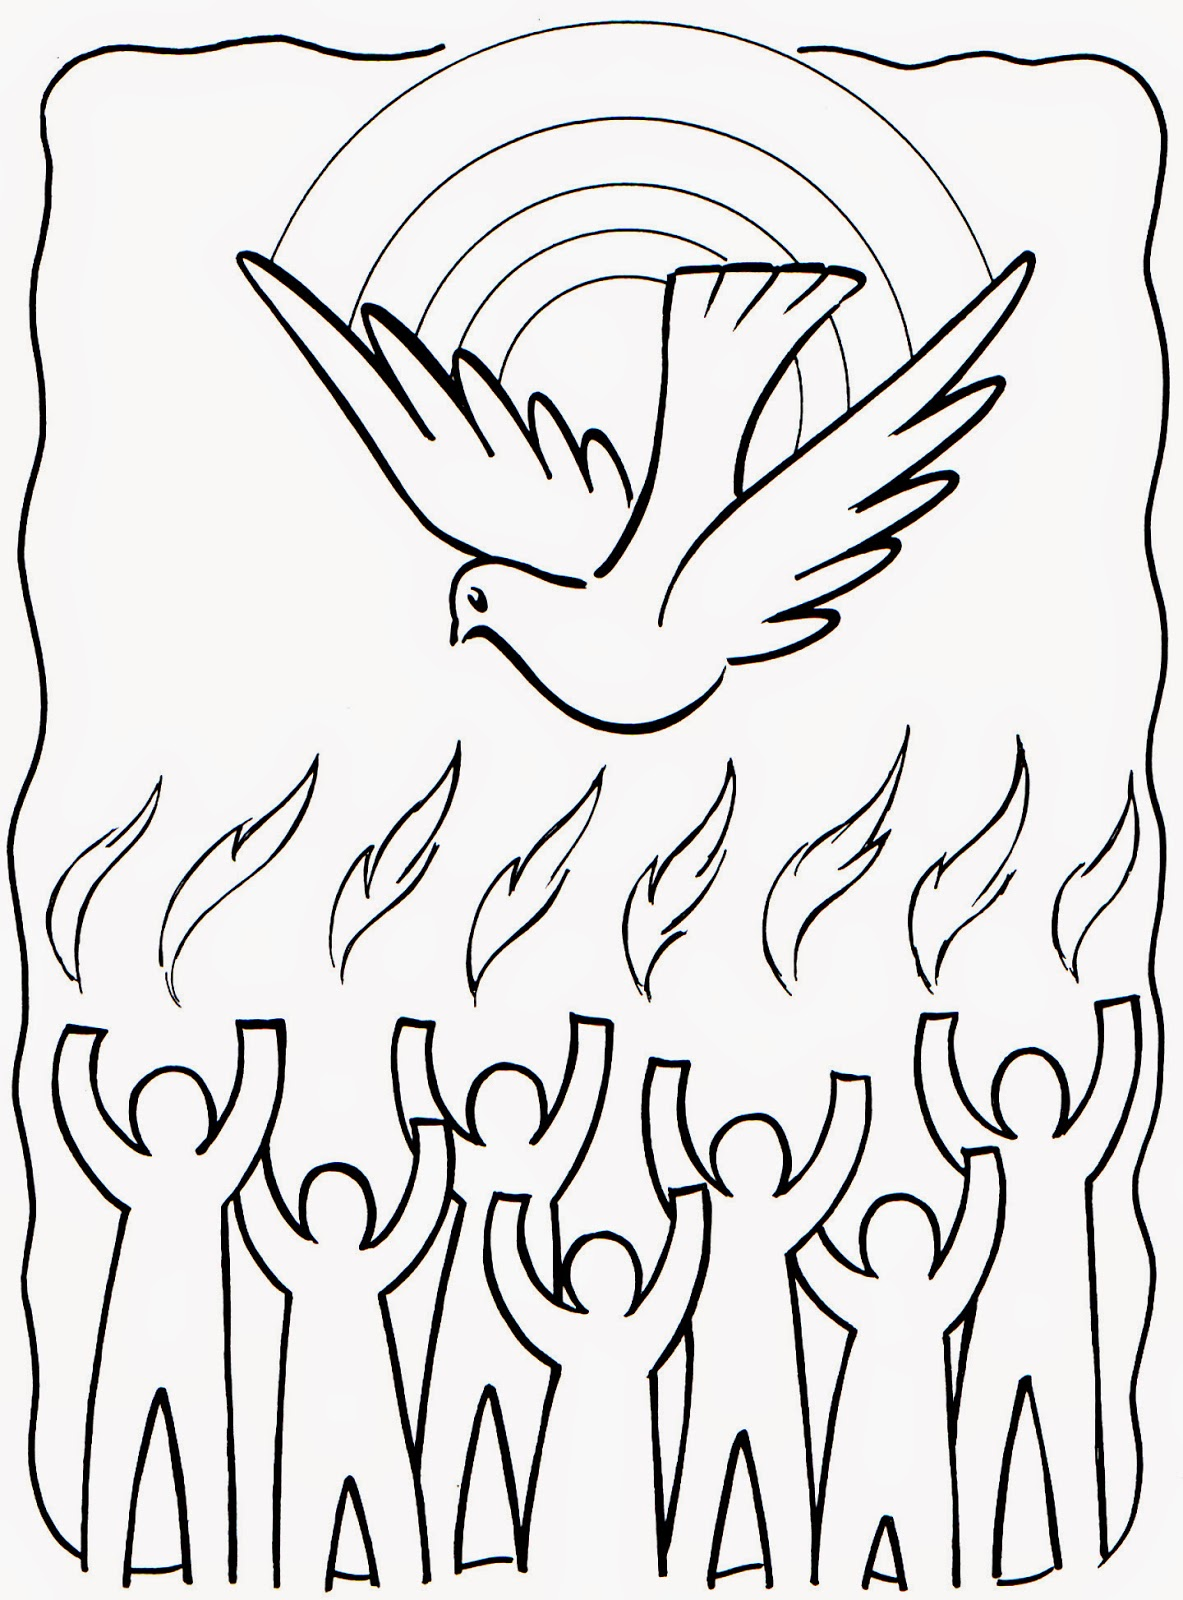 Colección de Gifs ®: IMÁGENES DE PENTECOSTÉS PARA COLOREAR